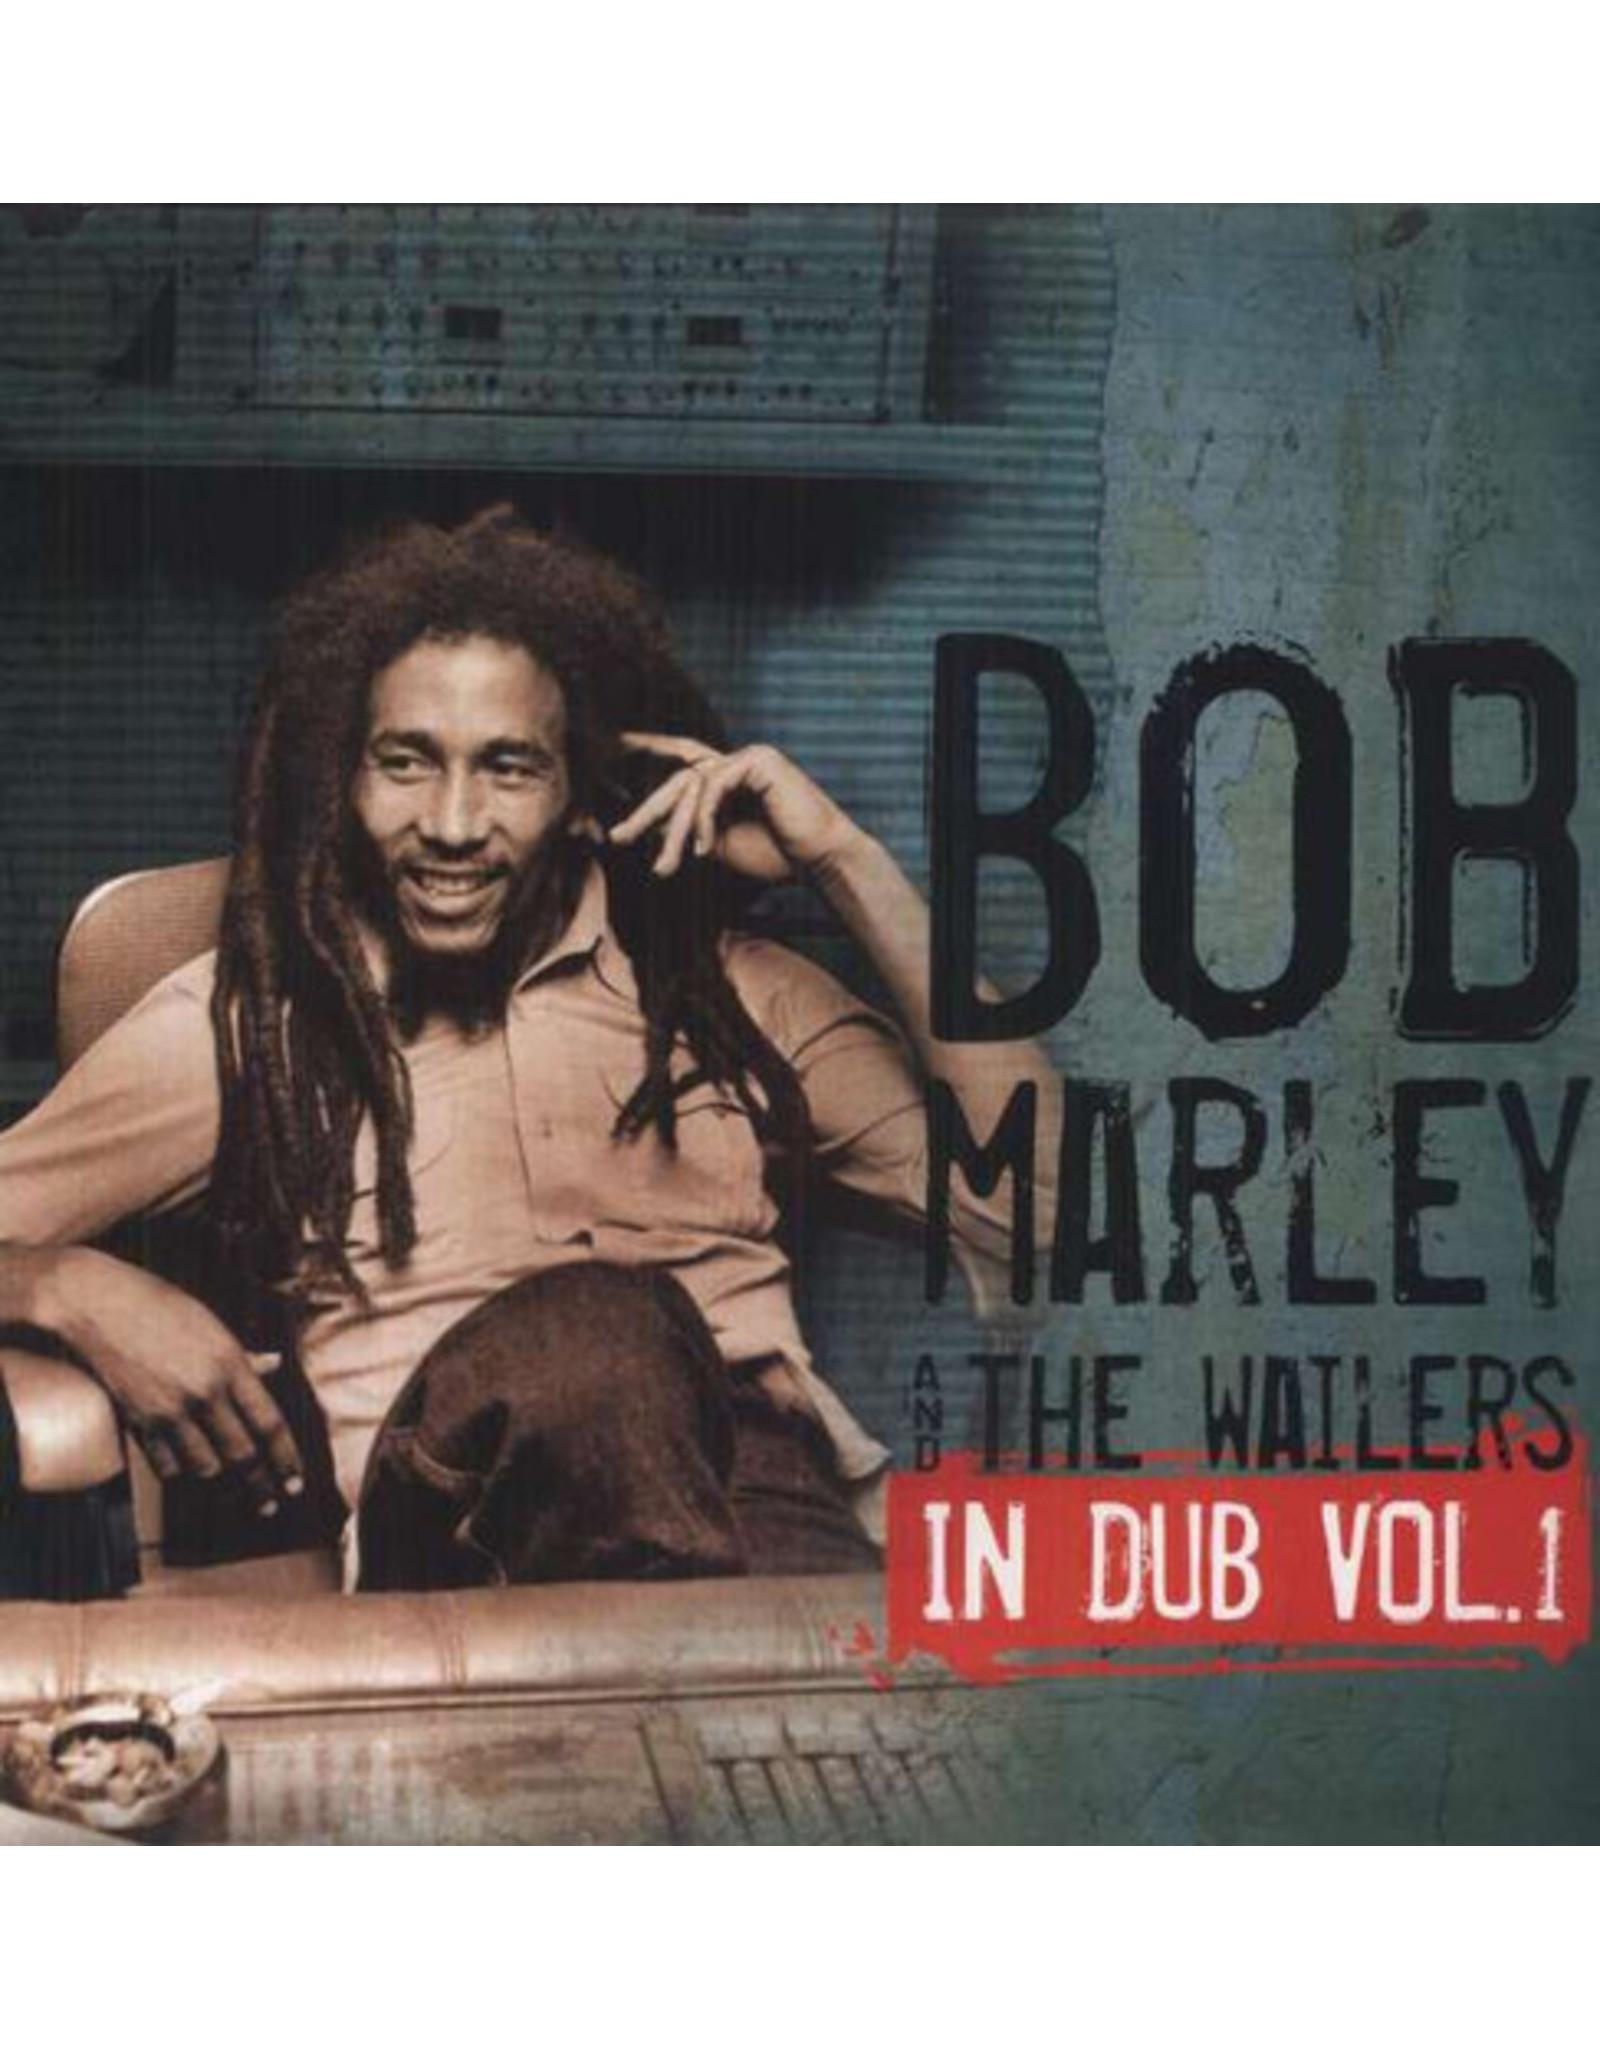 New Vinyl Bob Marley - In Dub Vol. 1 LP